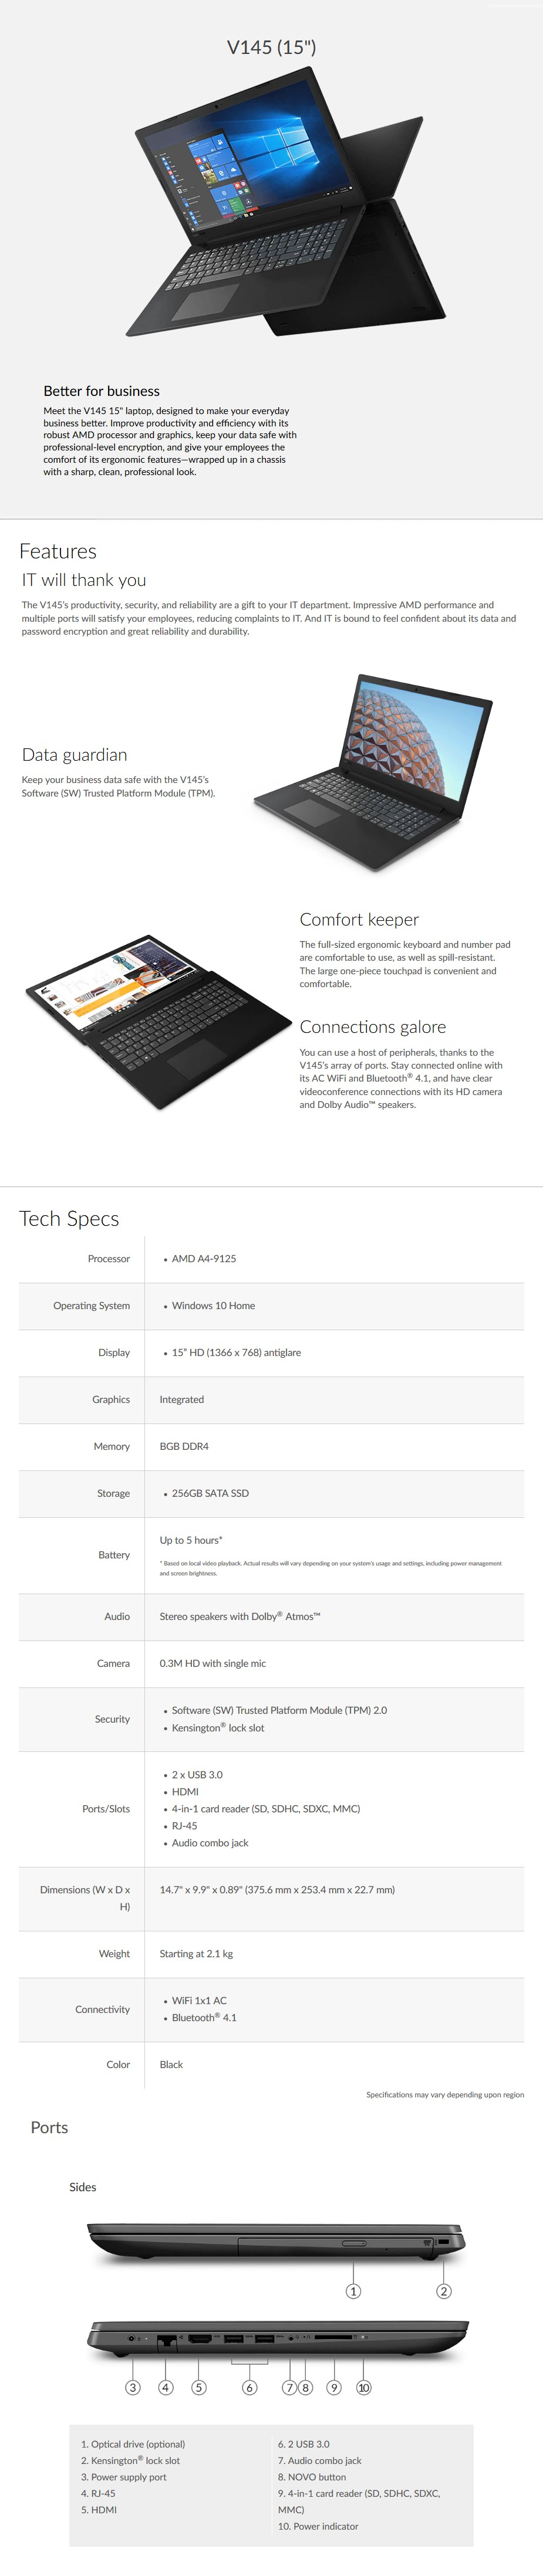 lenovo-v145-156-laptop-a49125-8gb-256gb-ssd-w10h-ac32365-7.jpg